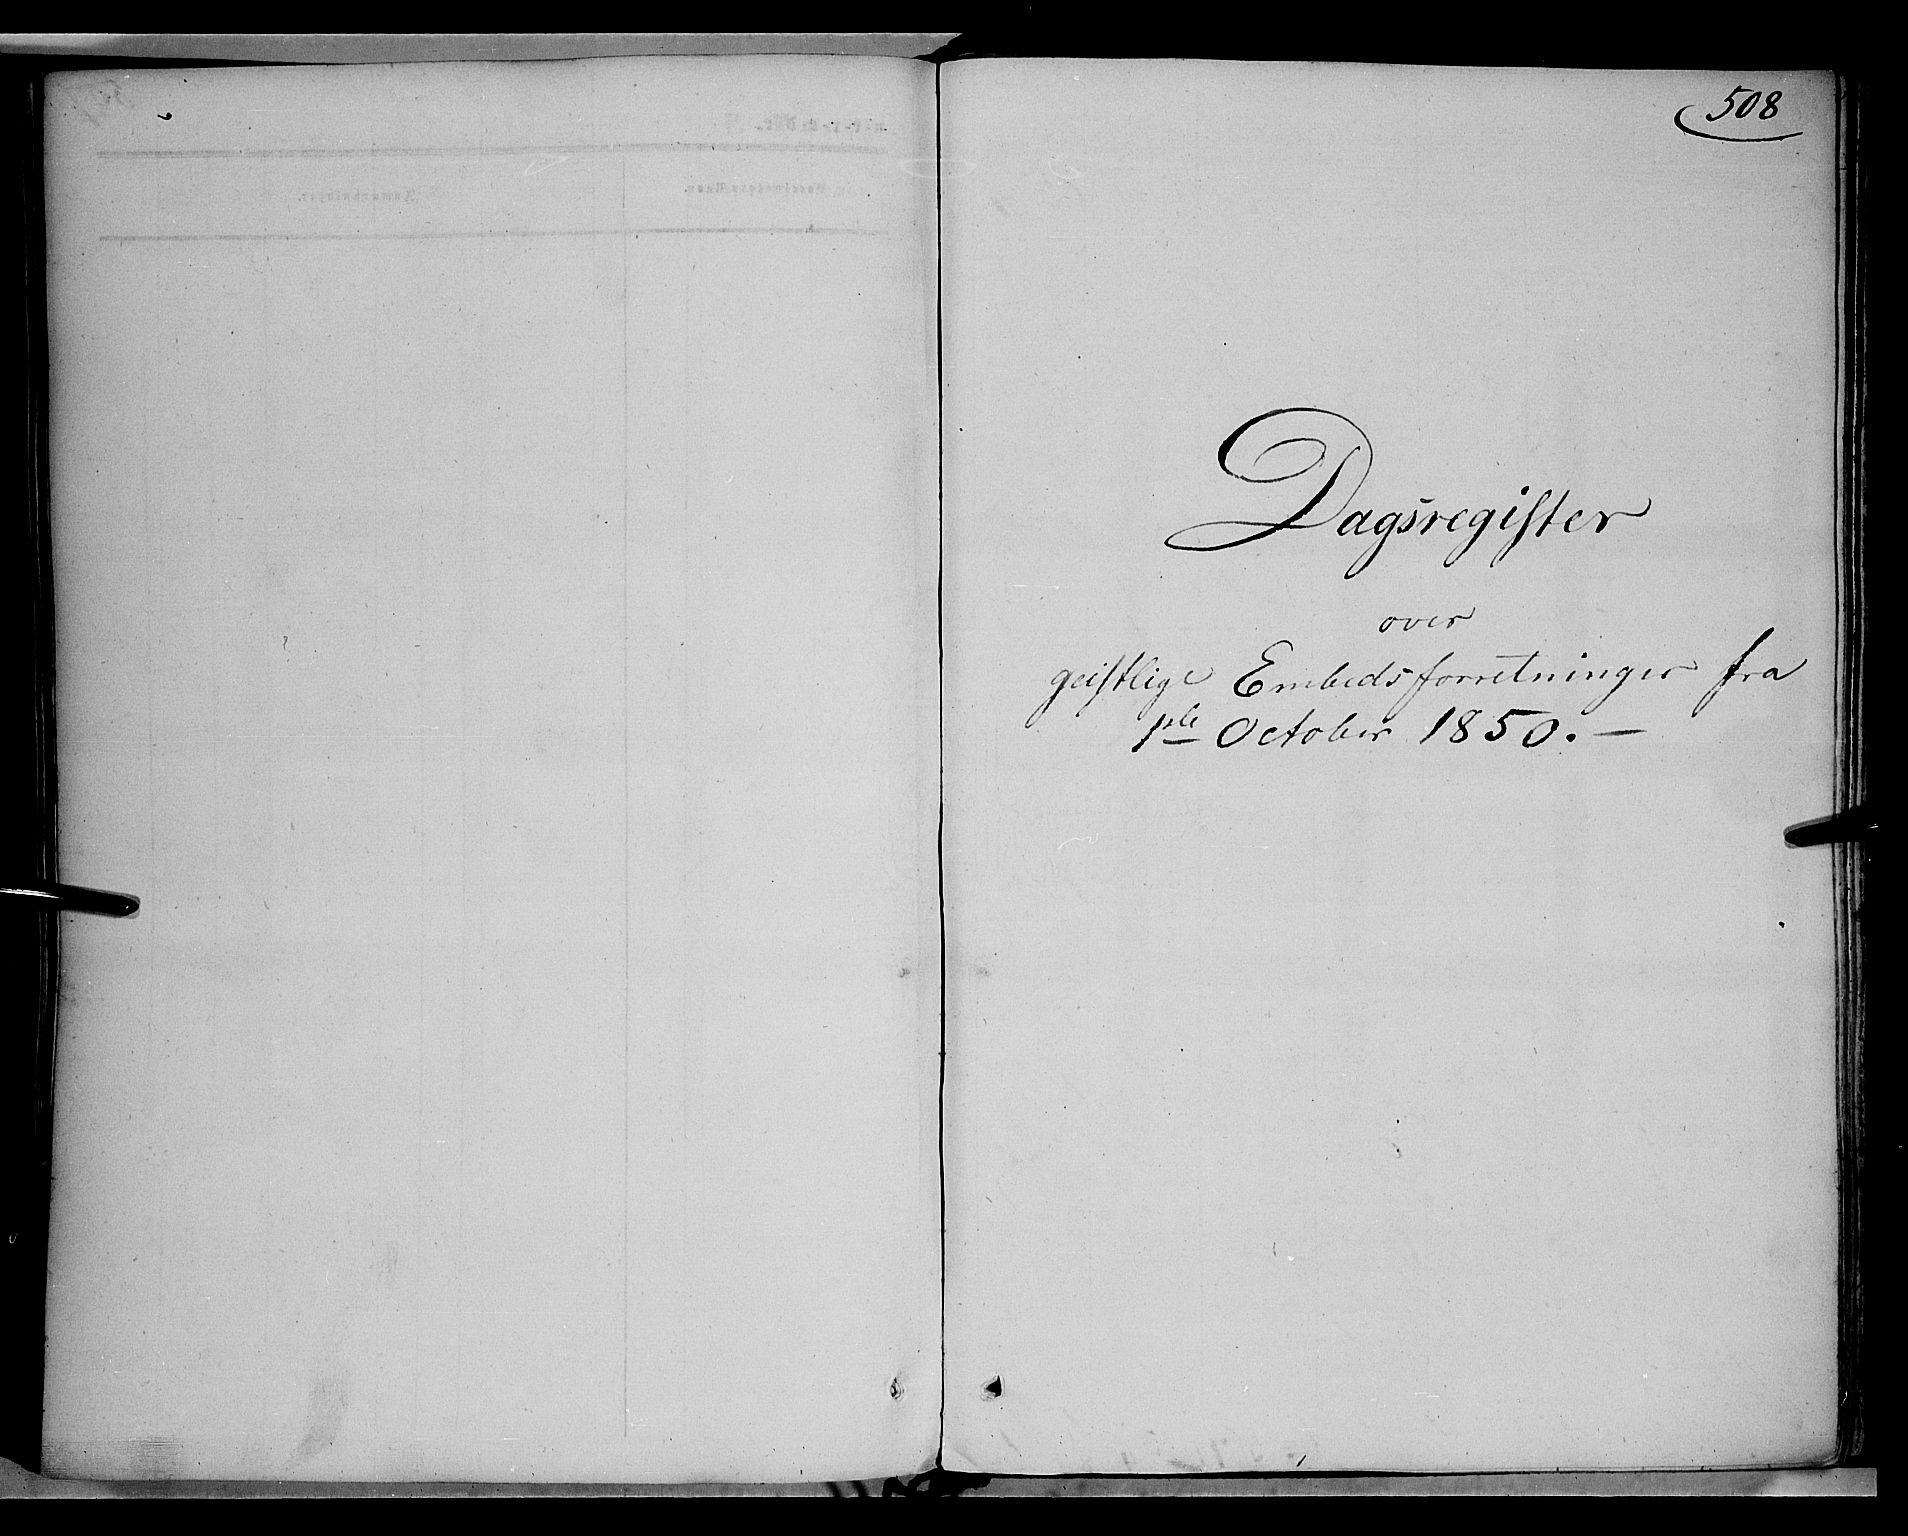 SAH, Gausdal prestekontor, Ministerialbok nr. 8, 1850-1861, s. 508